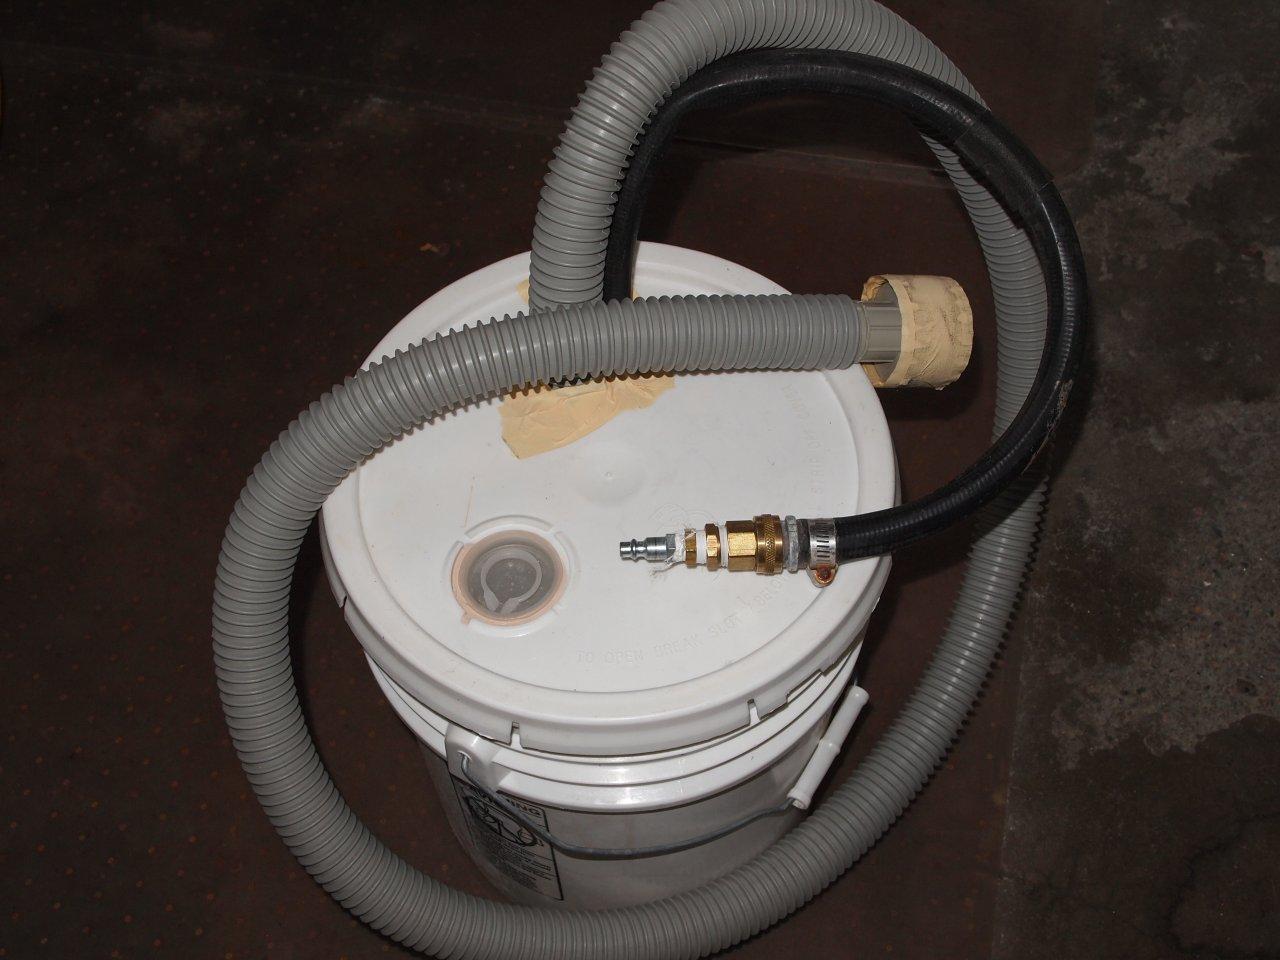 Smoke test to identify exhaust leak (ticking sound) | IH8MUD Forum